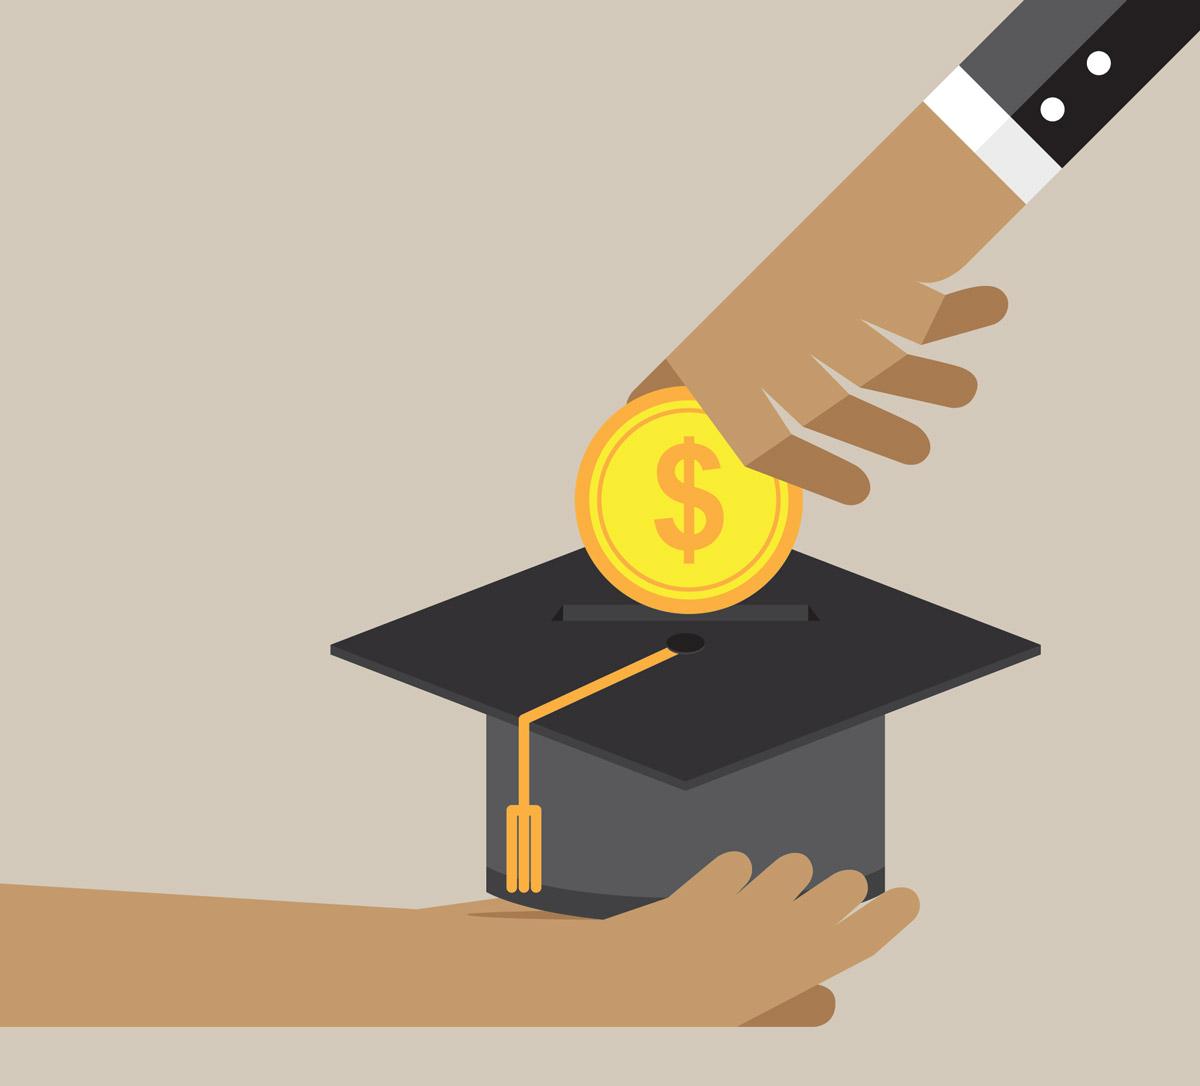 Georgia student debtGeorgia student debt how much student debt do georgia college students have?